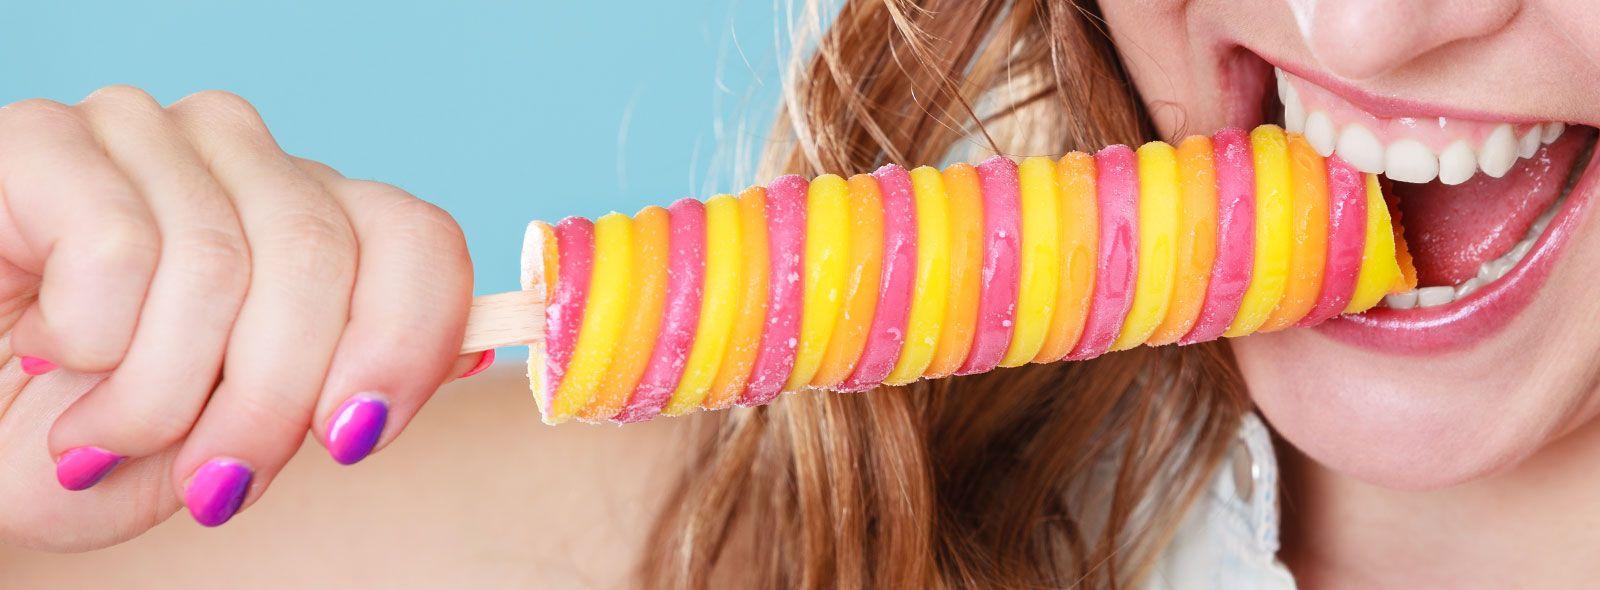 Mal di testa da gelato